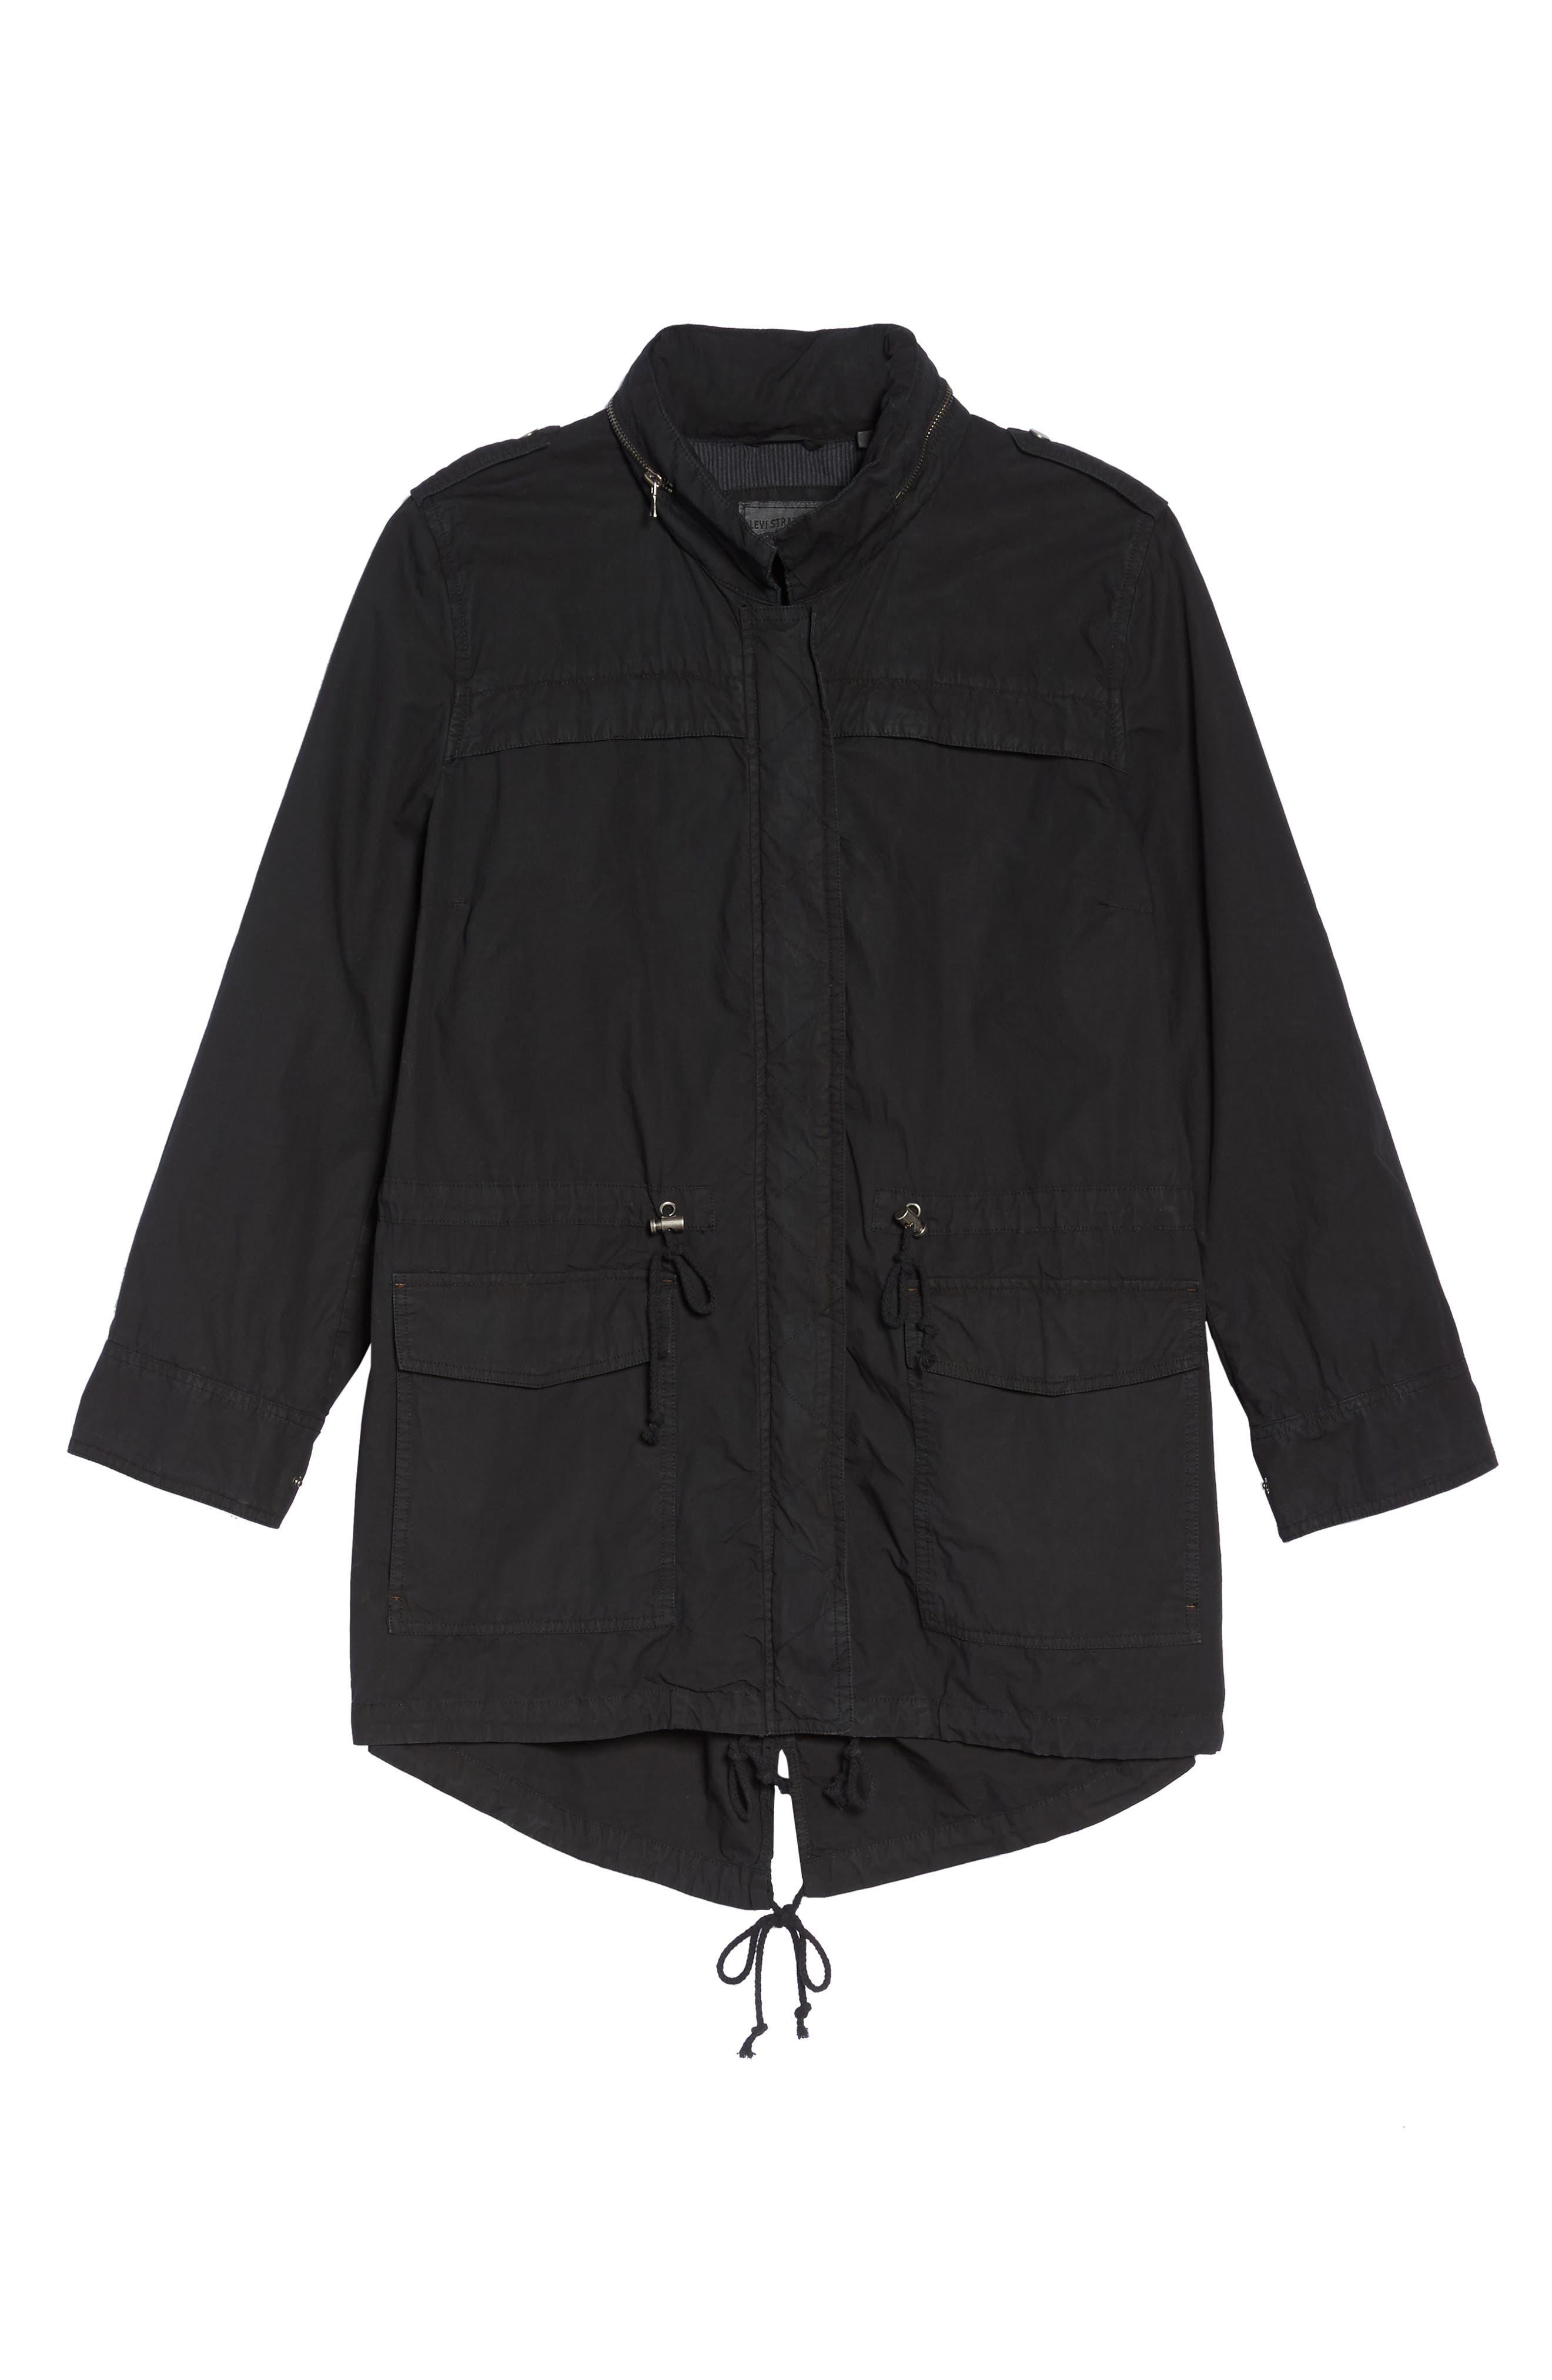 Parachute Hooded Cotton Utility Jacket,                             Alternate thumbnail 13, color,